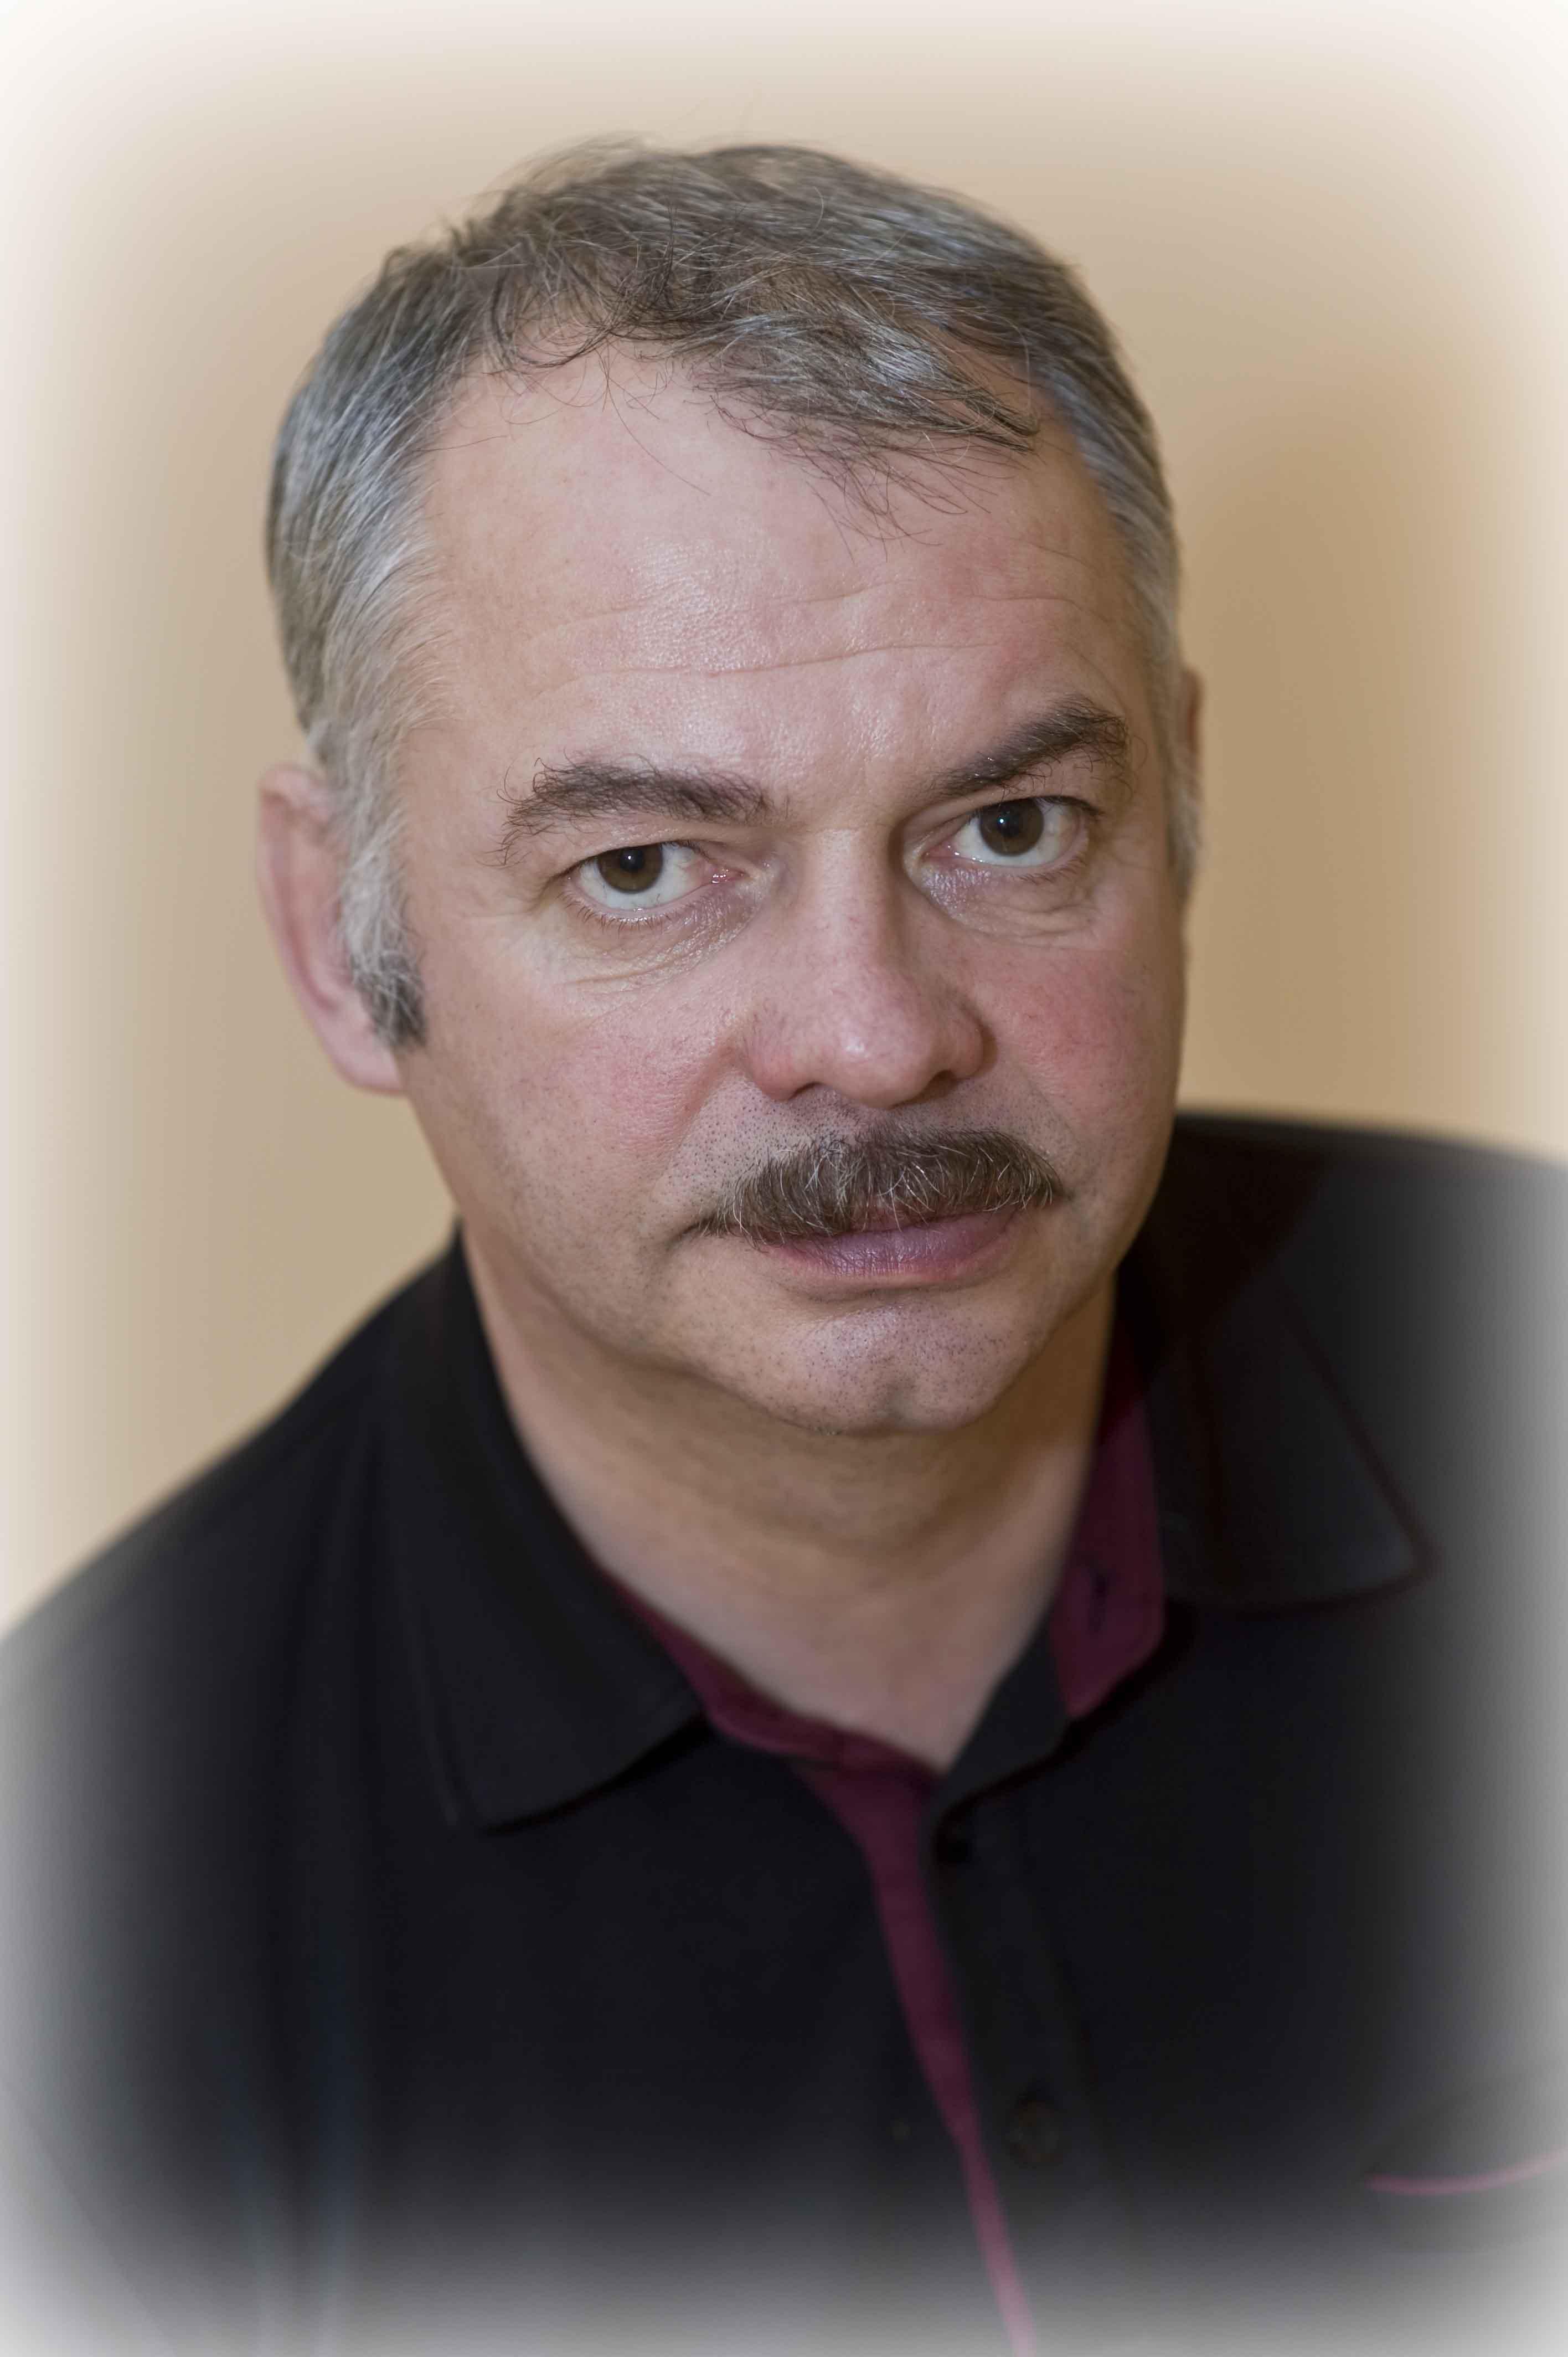 Кислицин Александр Витальевич